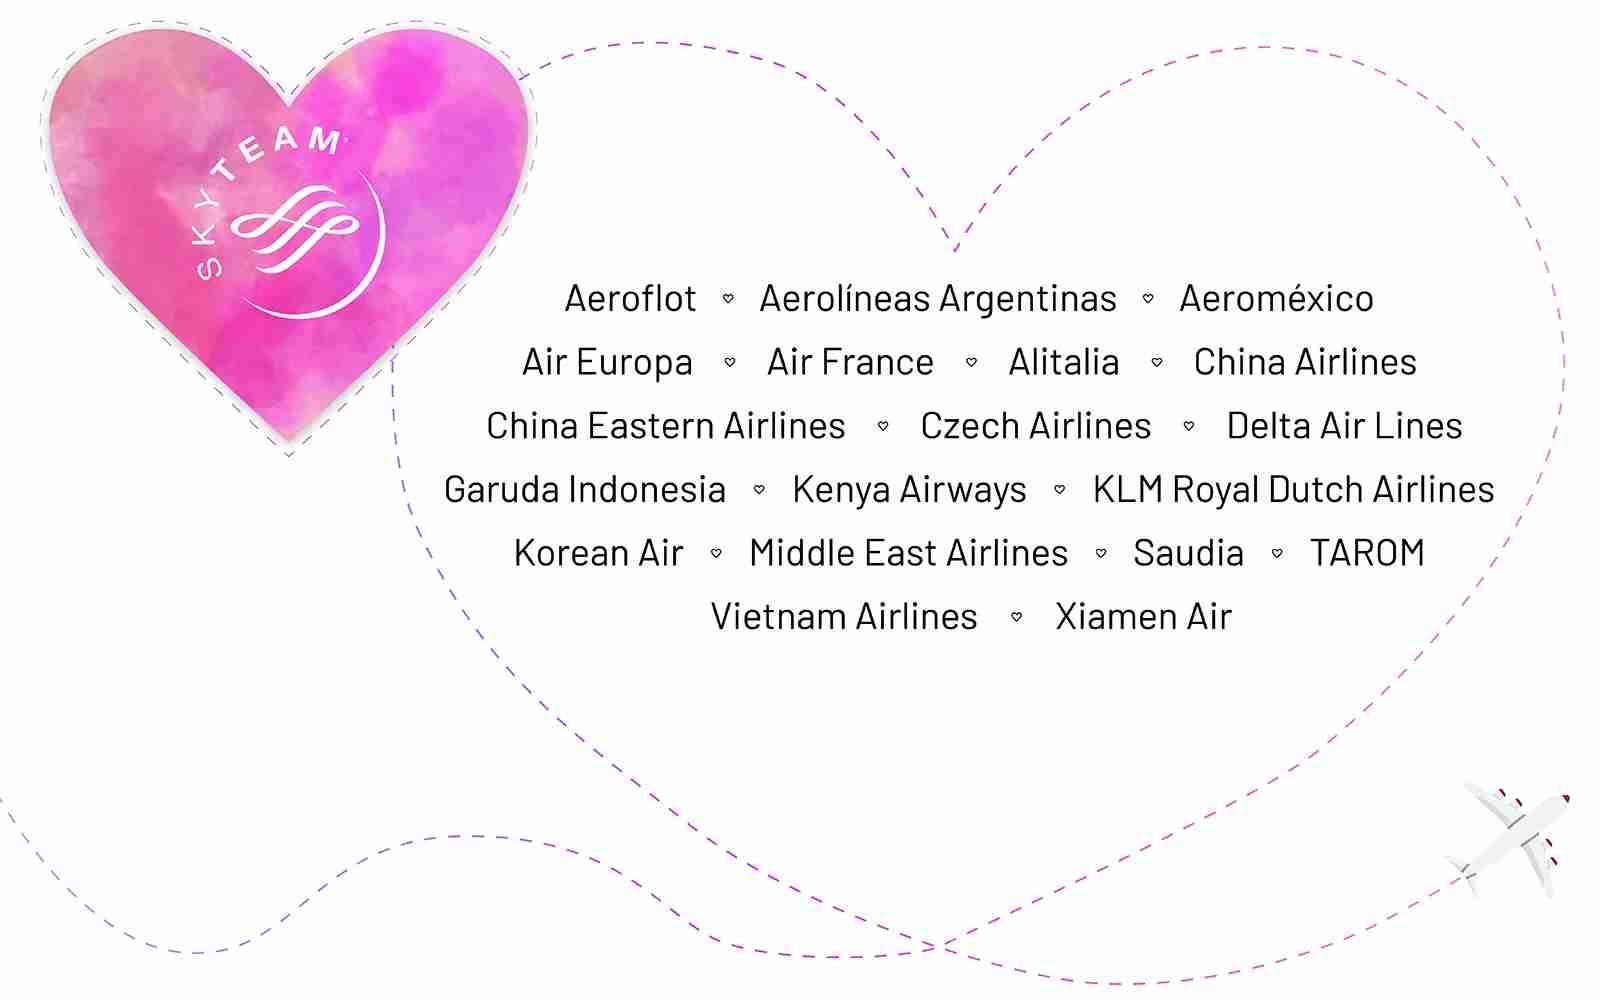 Skyteam Airlines: Aeroflot, Aerolineas Argentinas, Aeromexico, Air Europa, Air France, Alitalia, China Airlines, China Eastern Airlines, Czech Airlines, Delta Air Lines, Garuda Indonesia, Kenya Airways, KLM Royal Dutch Airlines, Korean Air, Middle East Airlines, Saudia, TAROM, Vietnam Airlines, Xiamen Air